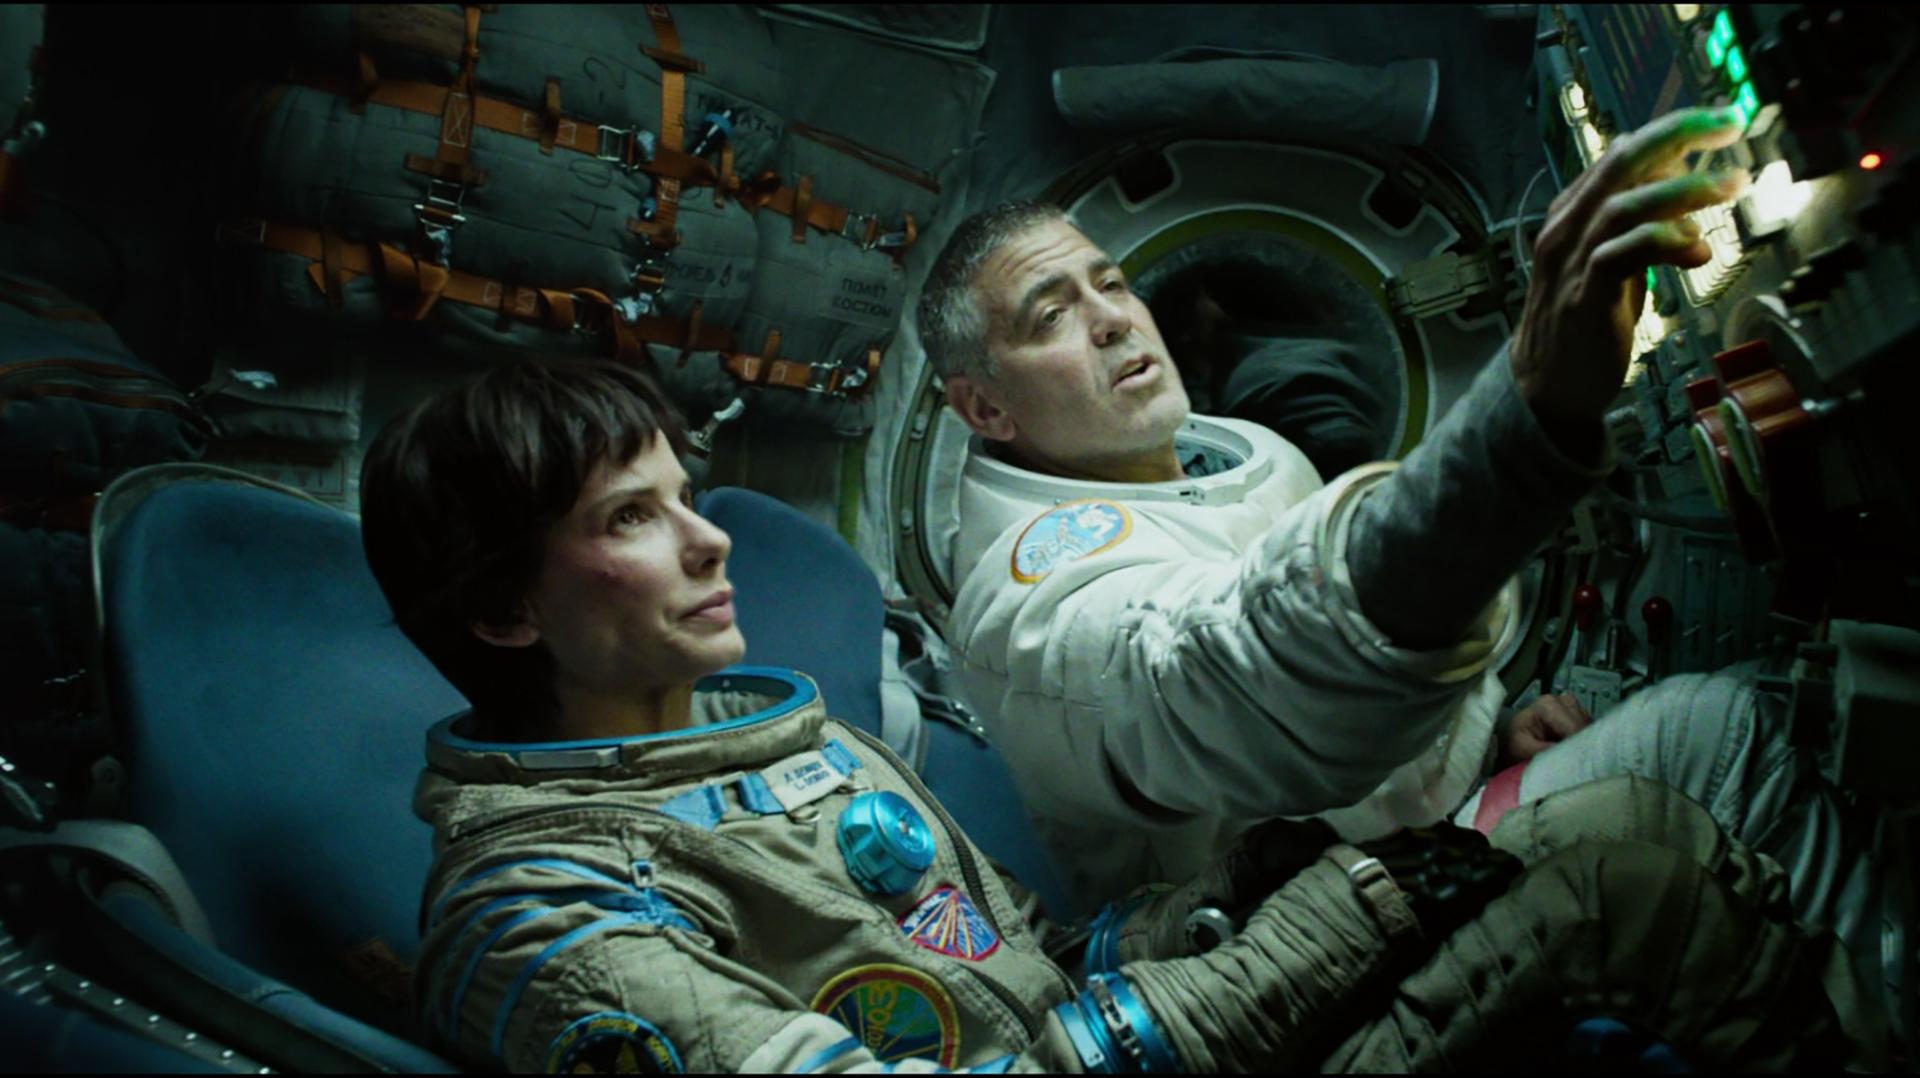 Мини-бикини для космонавтов